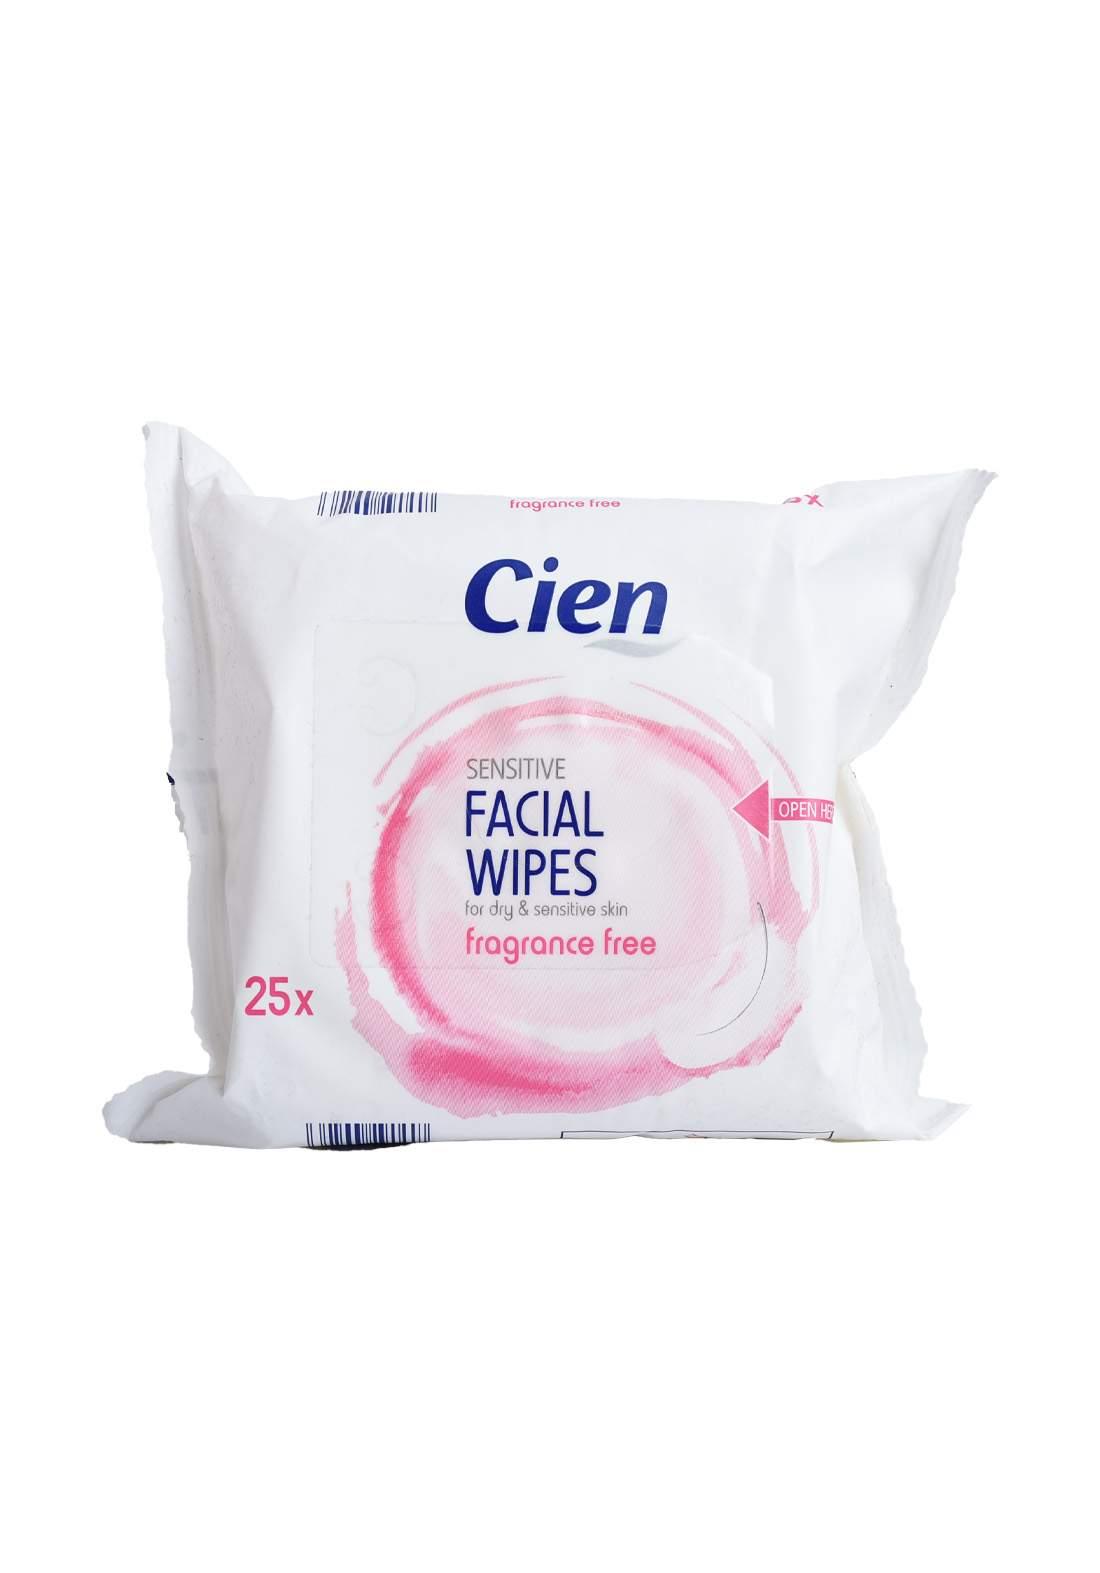 Cien Sensitive Facial Wipes for Sensitive and Dry Skin مناديل تنظيف الوجه